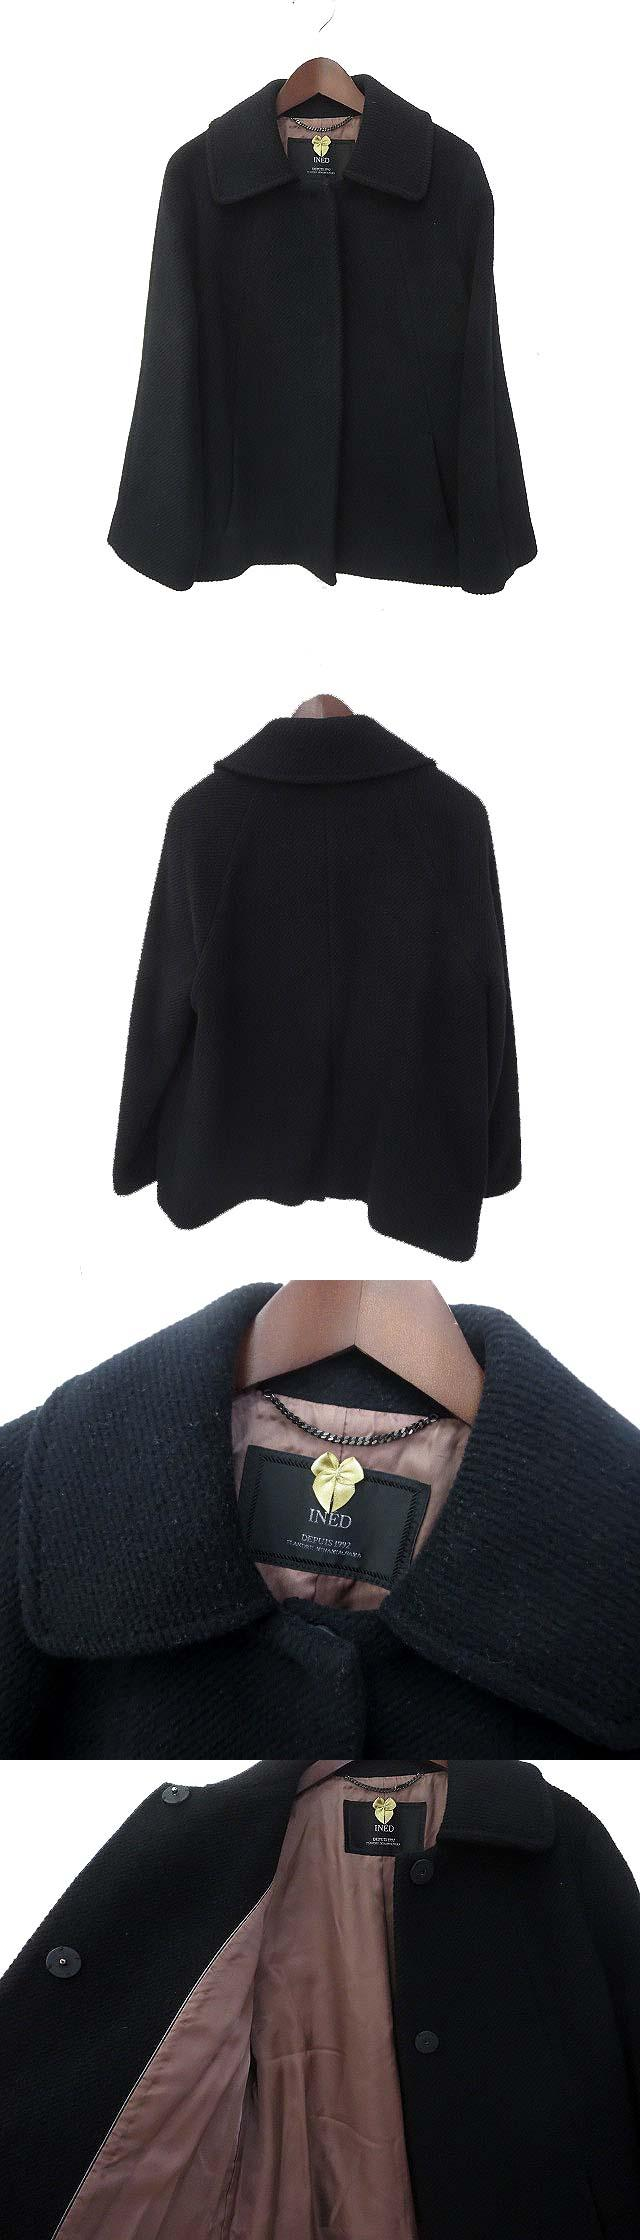 INED イネド ステンカラー フレア アンゴラ混 ウール コート 11 ブラック